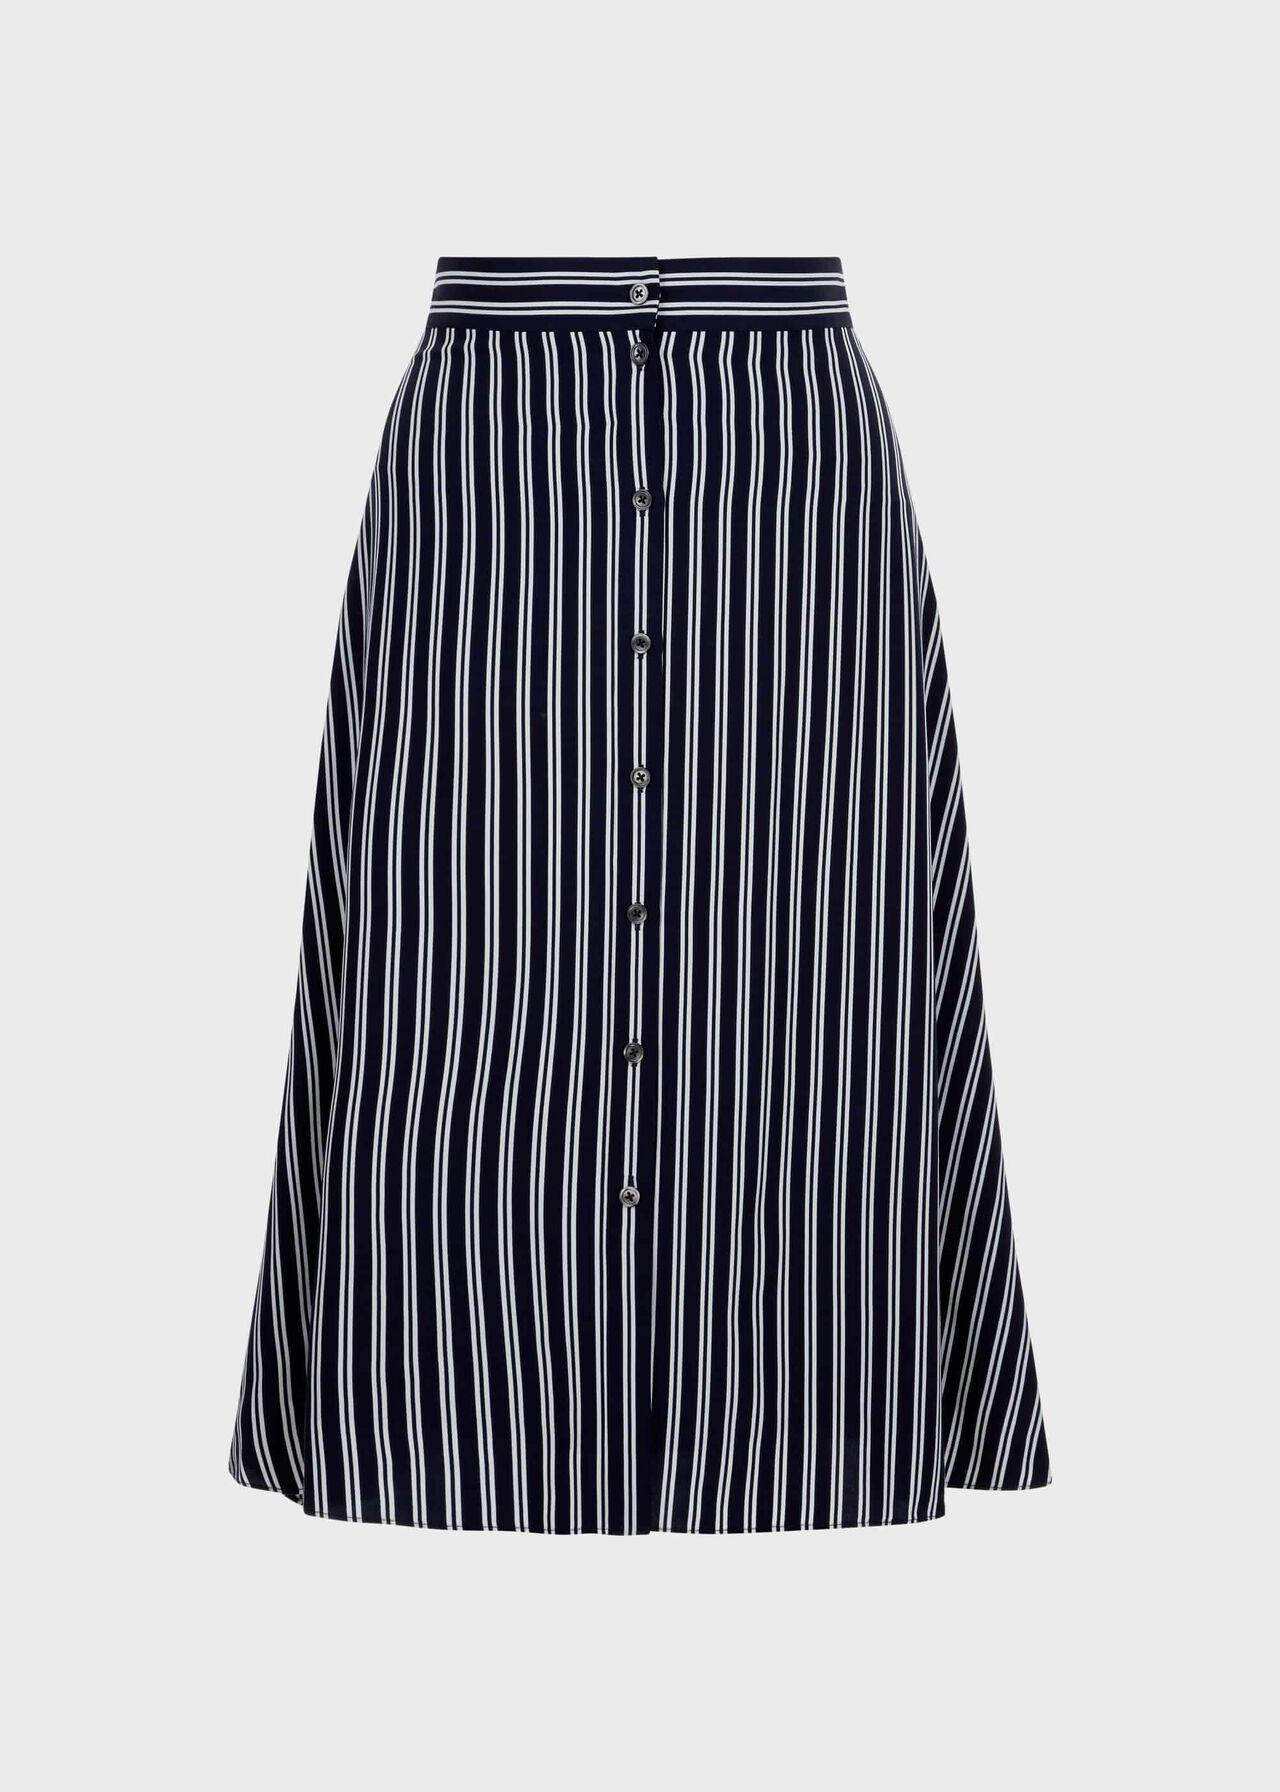 Monroe Stripe A Line Skirt, Navy Ivory, hi-res